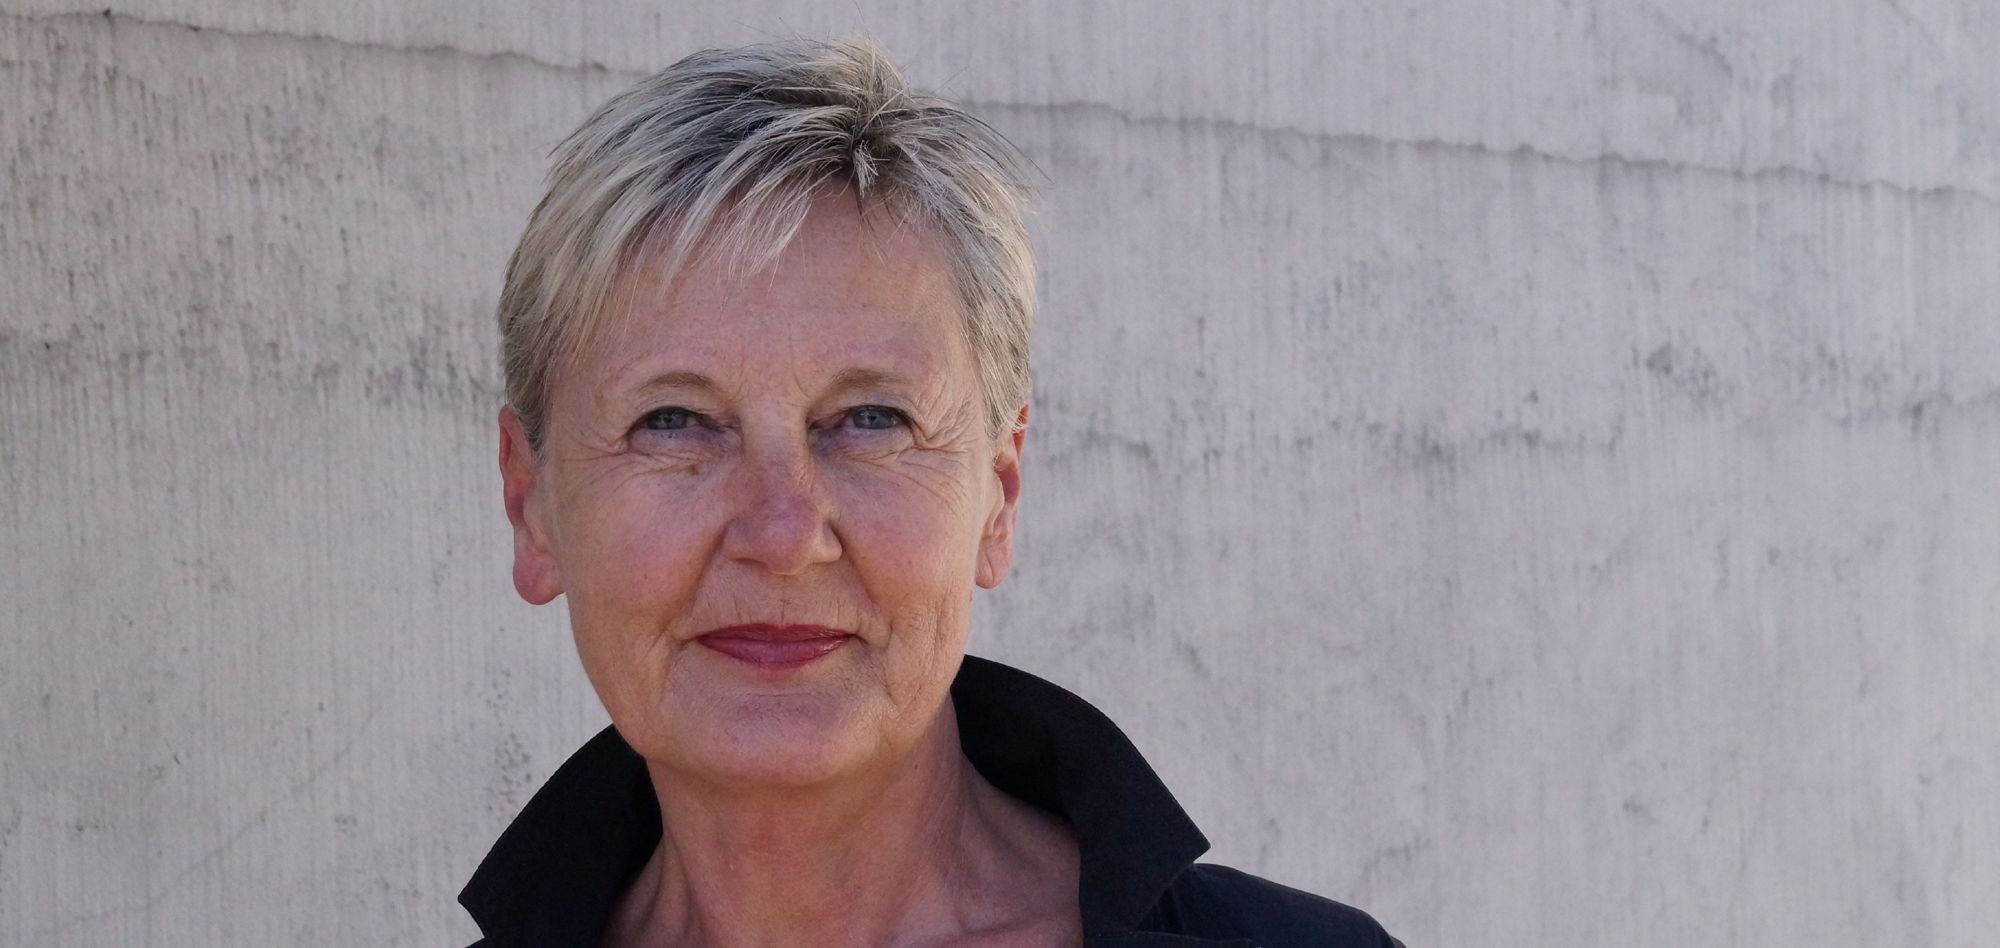 Randi Øverland, gruppeleder for Arbeiderpartiet på fylkestinget i Vest-Agder